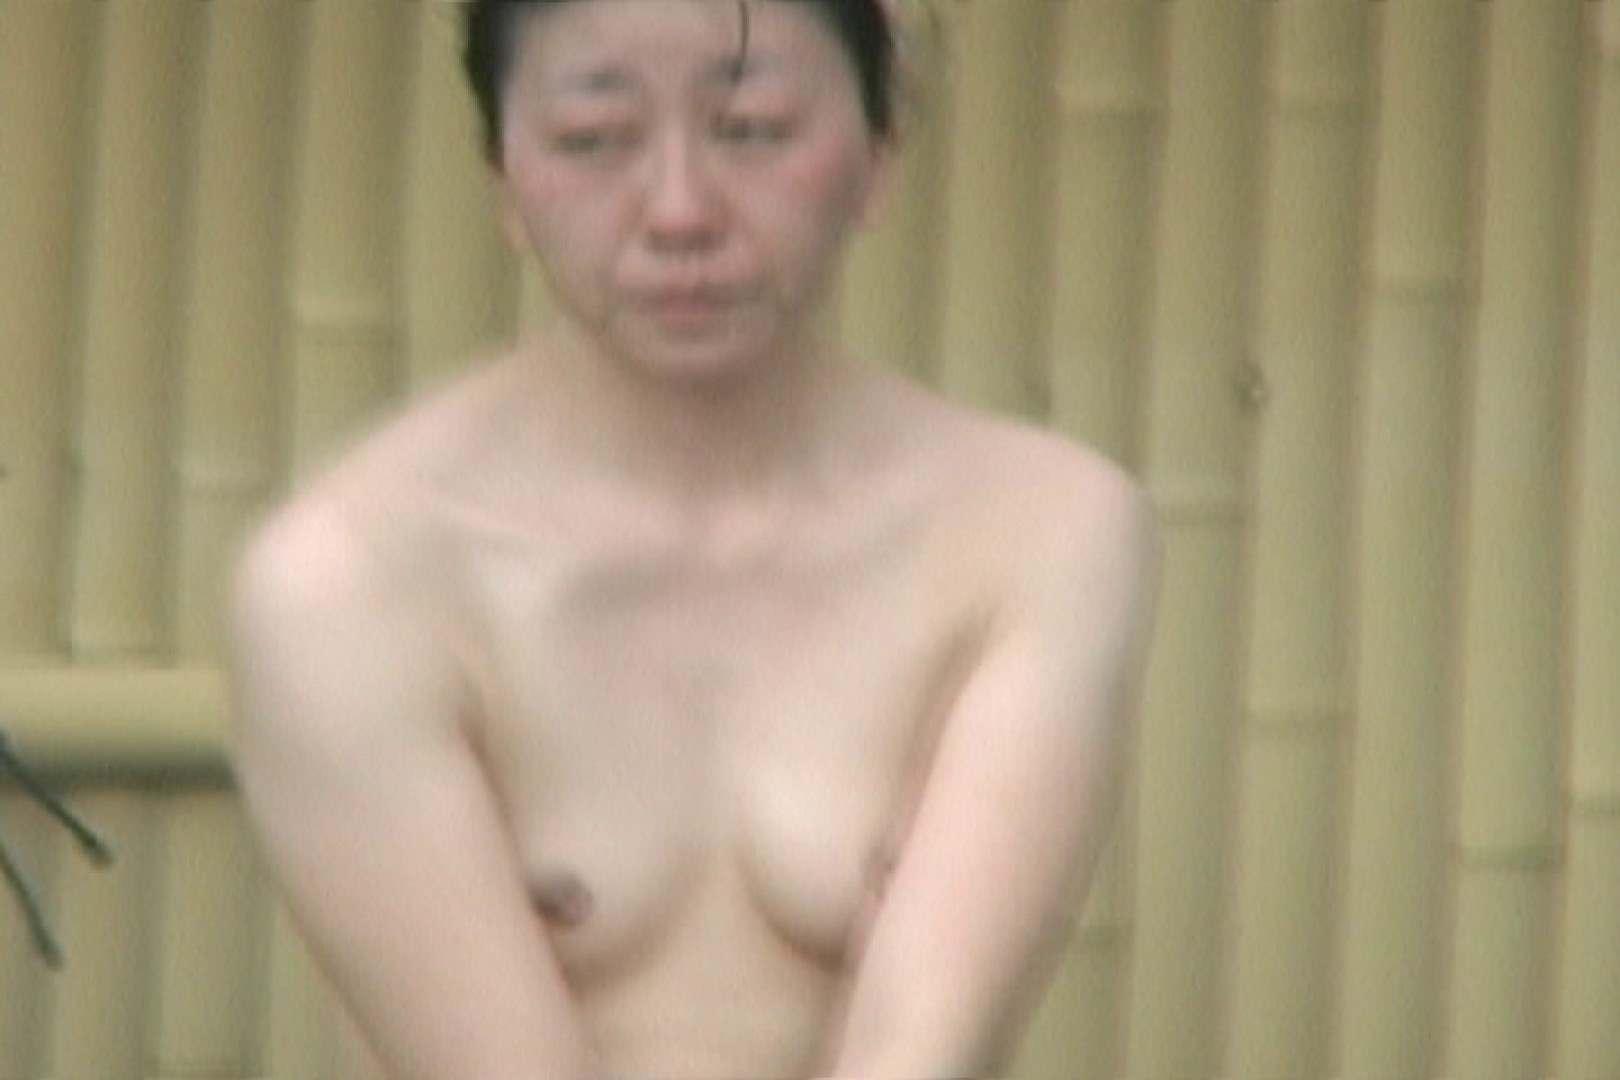 Aquaな露天風呂Vol.594 盗撮師作品  79pic 3